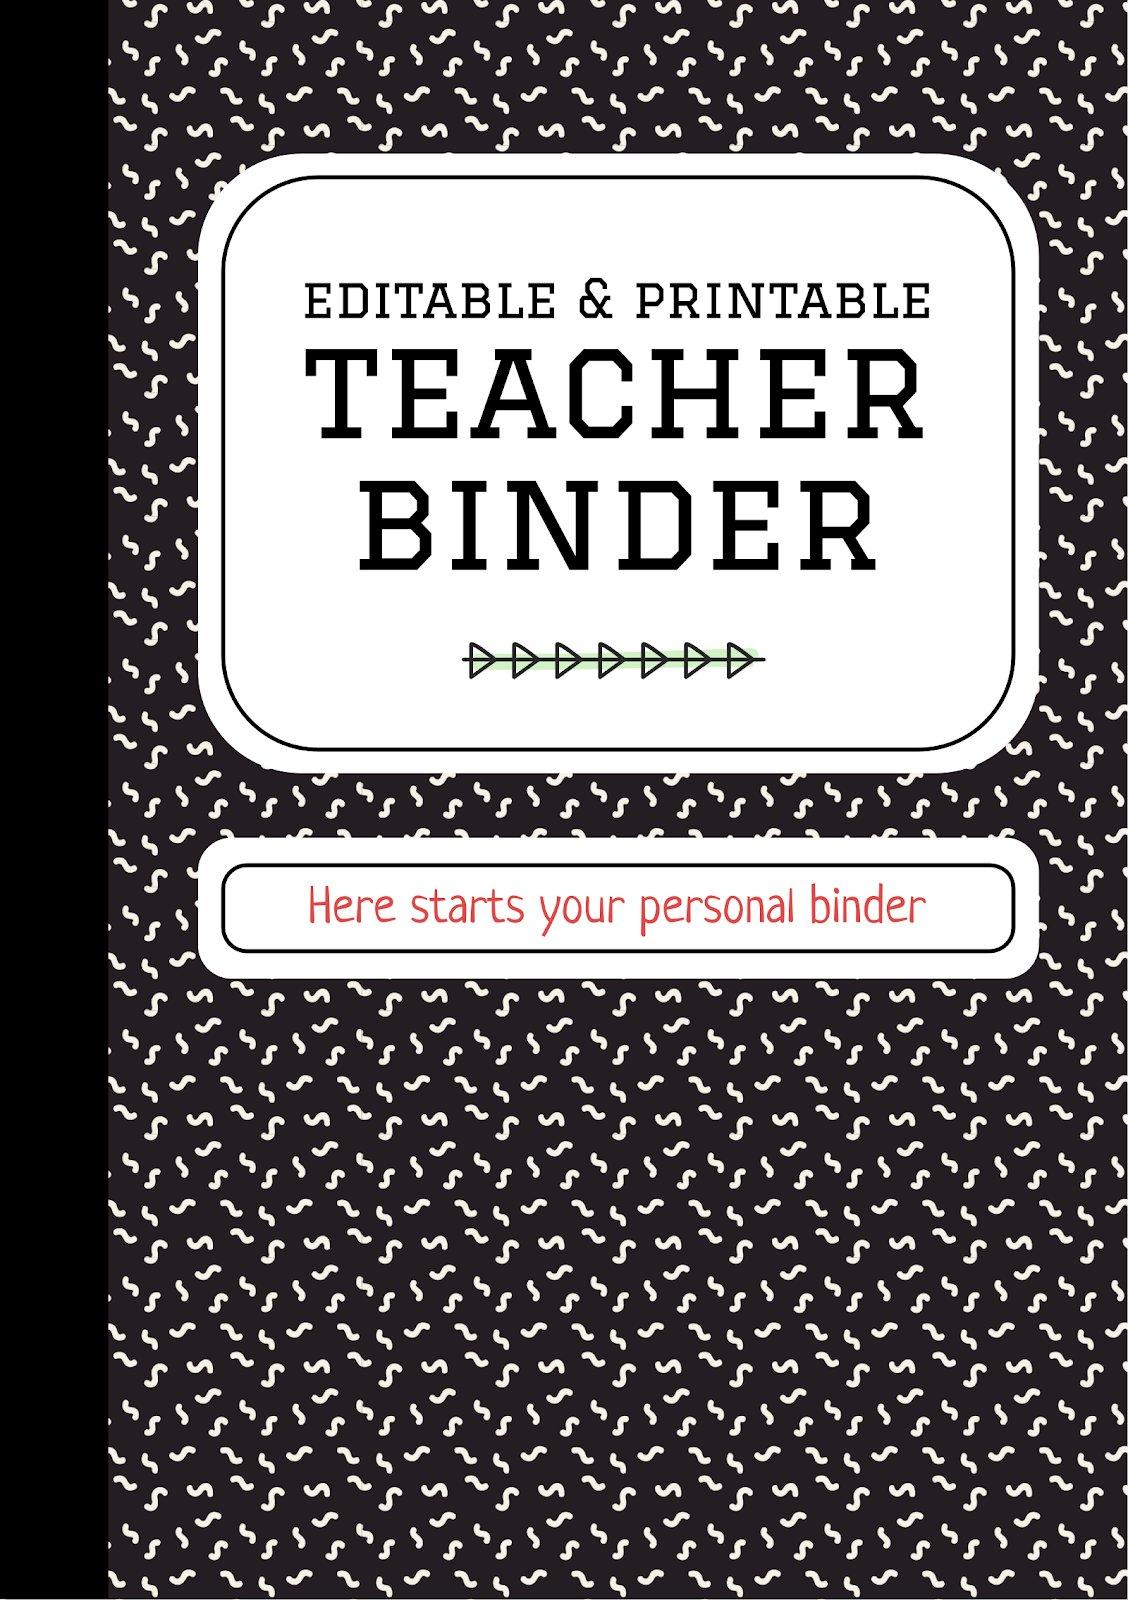 Editable & Printable Teacher Binder presentation template